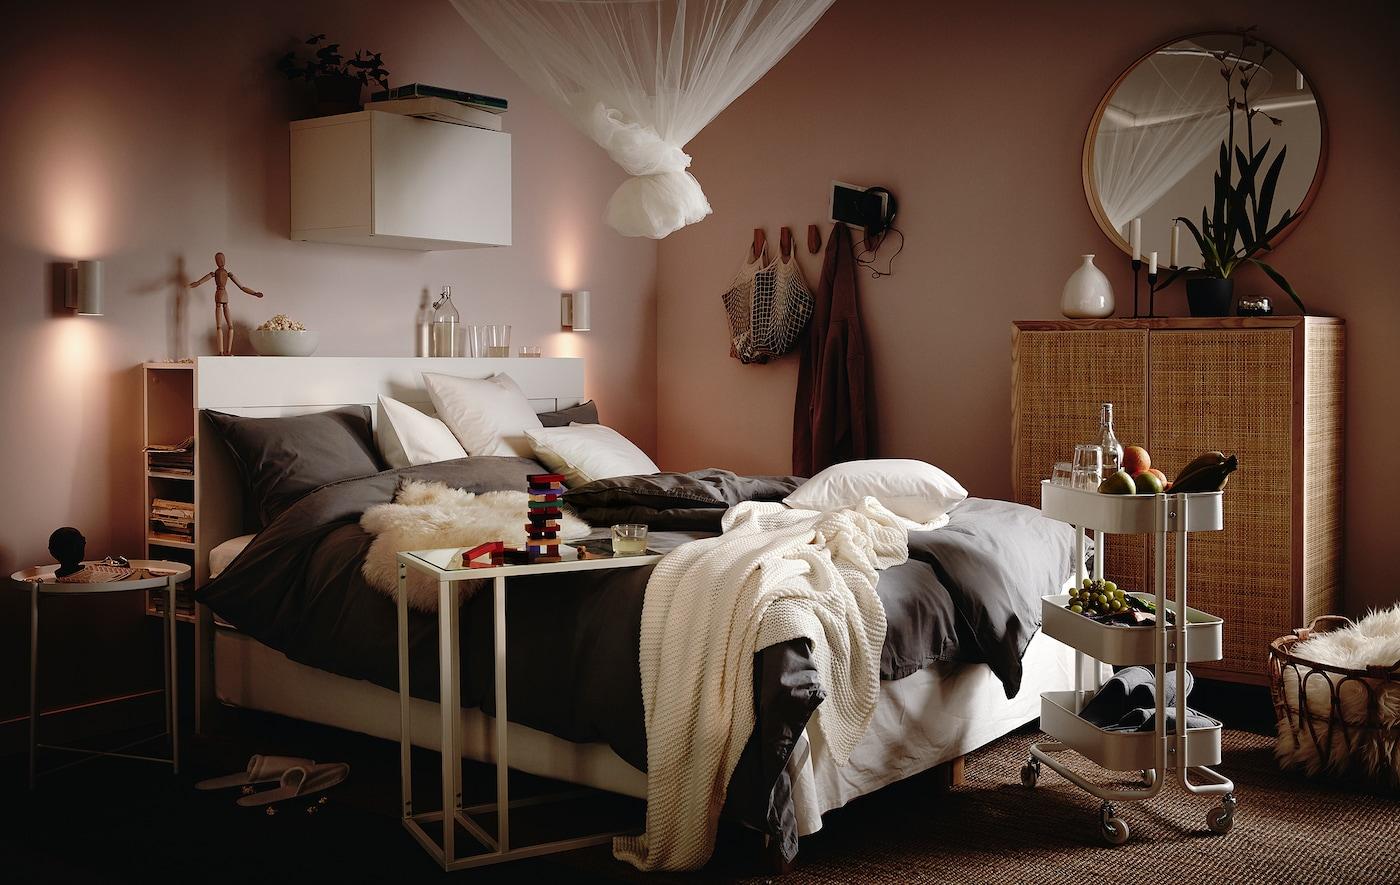 Krevet pun meke posteljine, ukrasnih jastuka i laganih deka, kolica s grickalicama i pićima pokraj kreveta, dok je iznad kreveta vidljiva mreža zavezana u čvor.